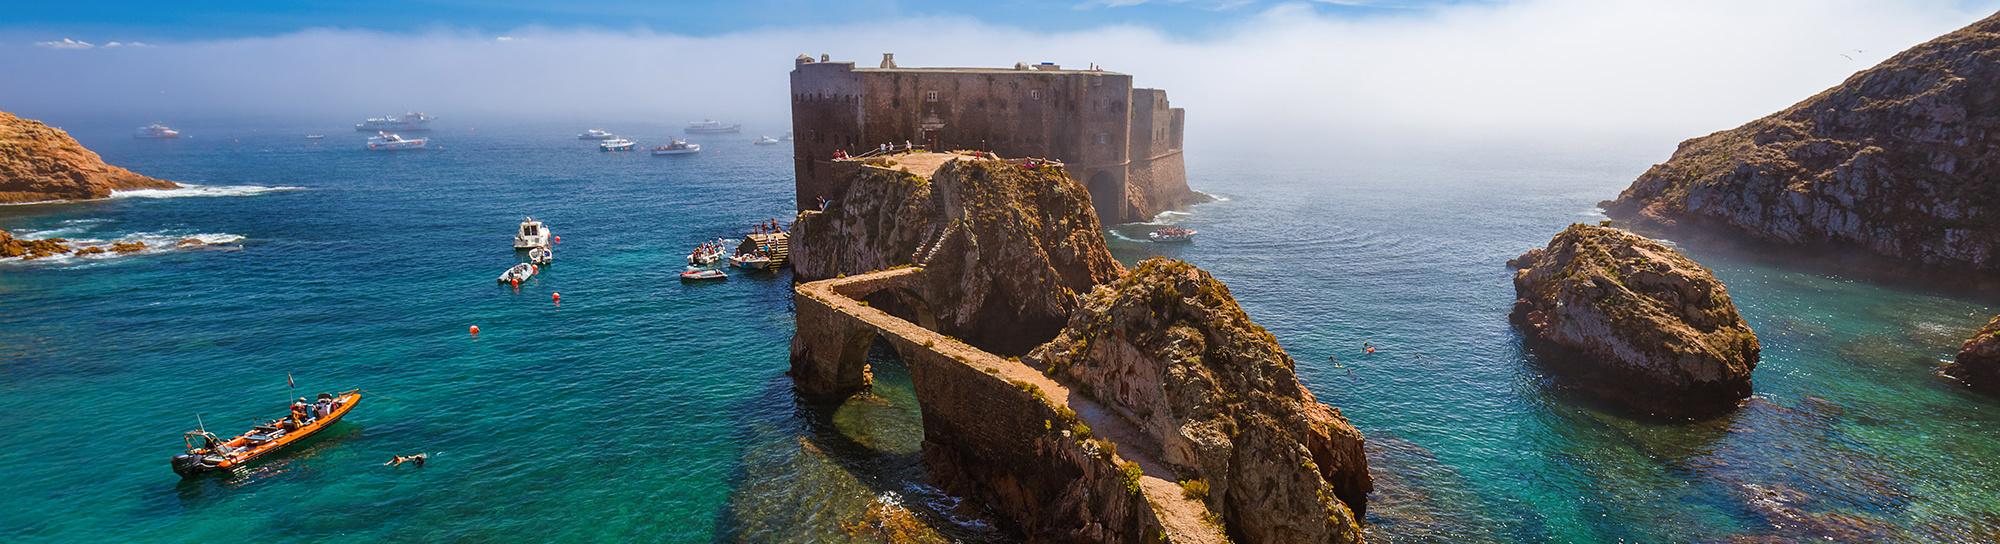 Portugal Berlingas Islands